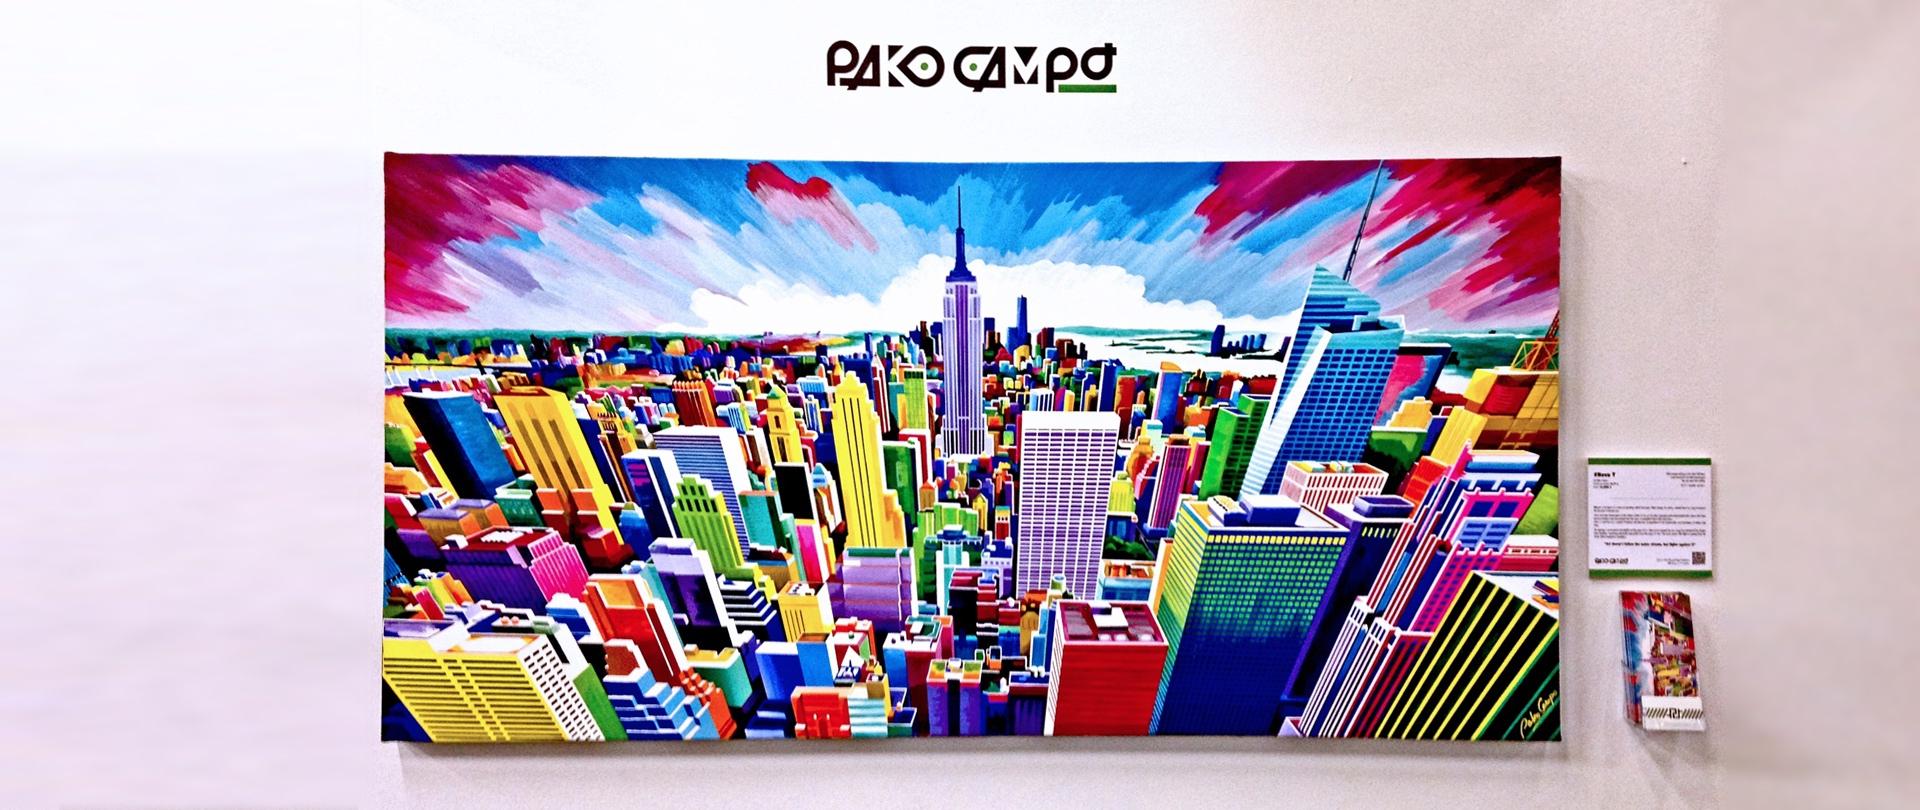 Artexpo New York 2018 - #NovaY - Pako Campo